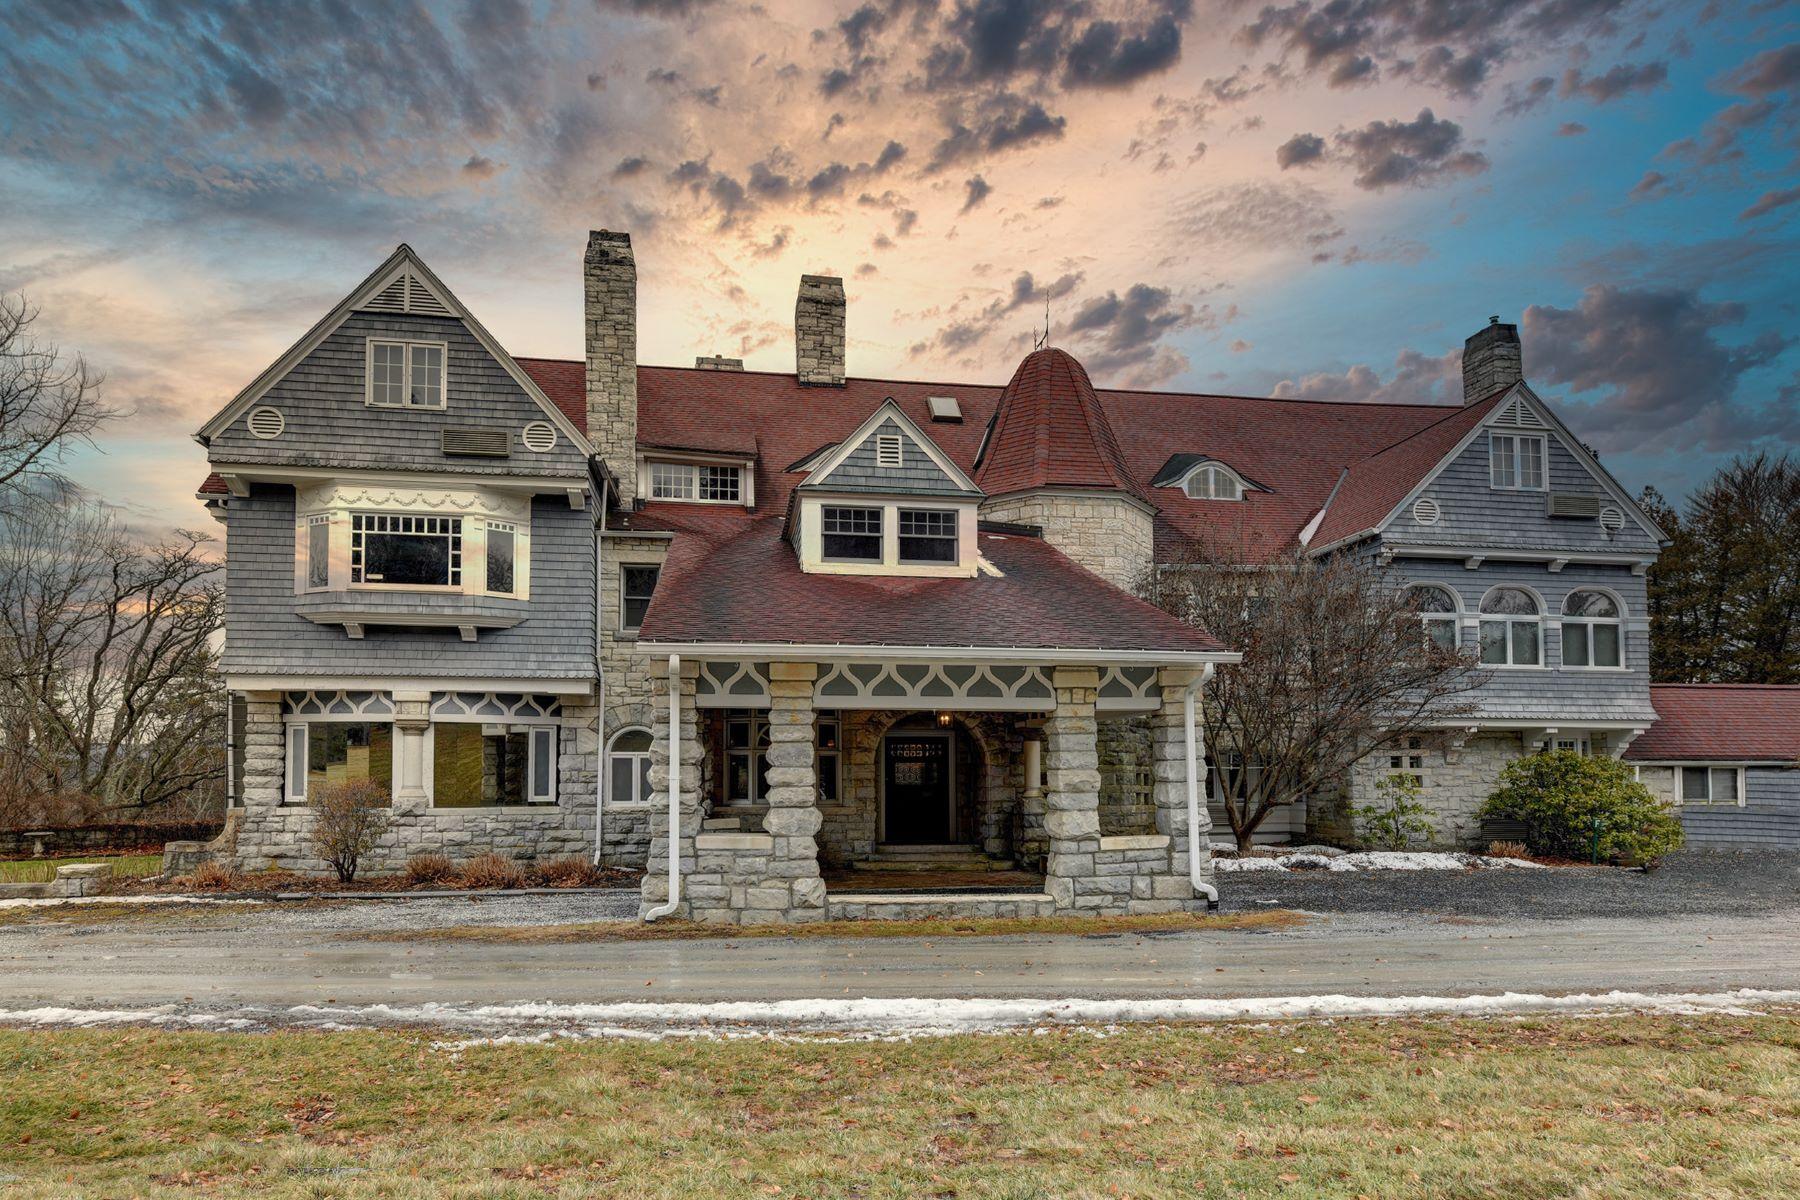 Condominiums for Sale at Berkshire Premier Condo at Oronoque 11 Prospect Hill Rd C Stockbridge, Massachusetts 01262 United States